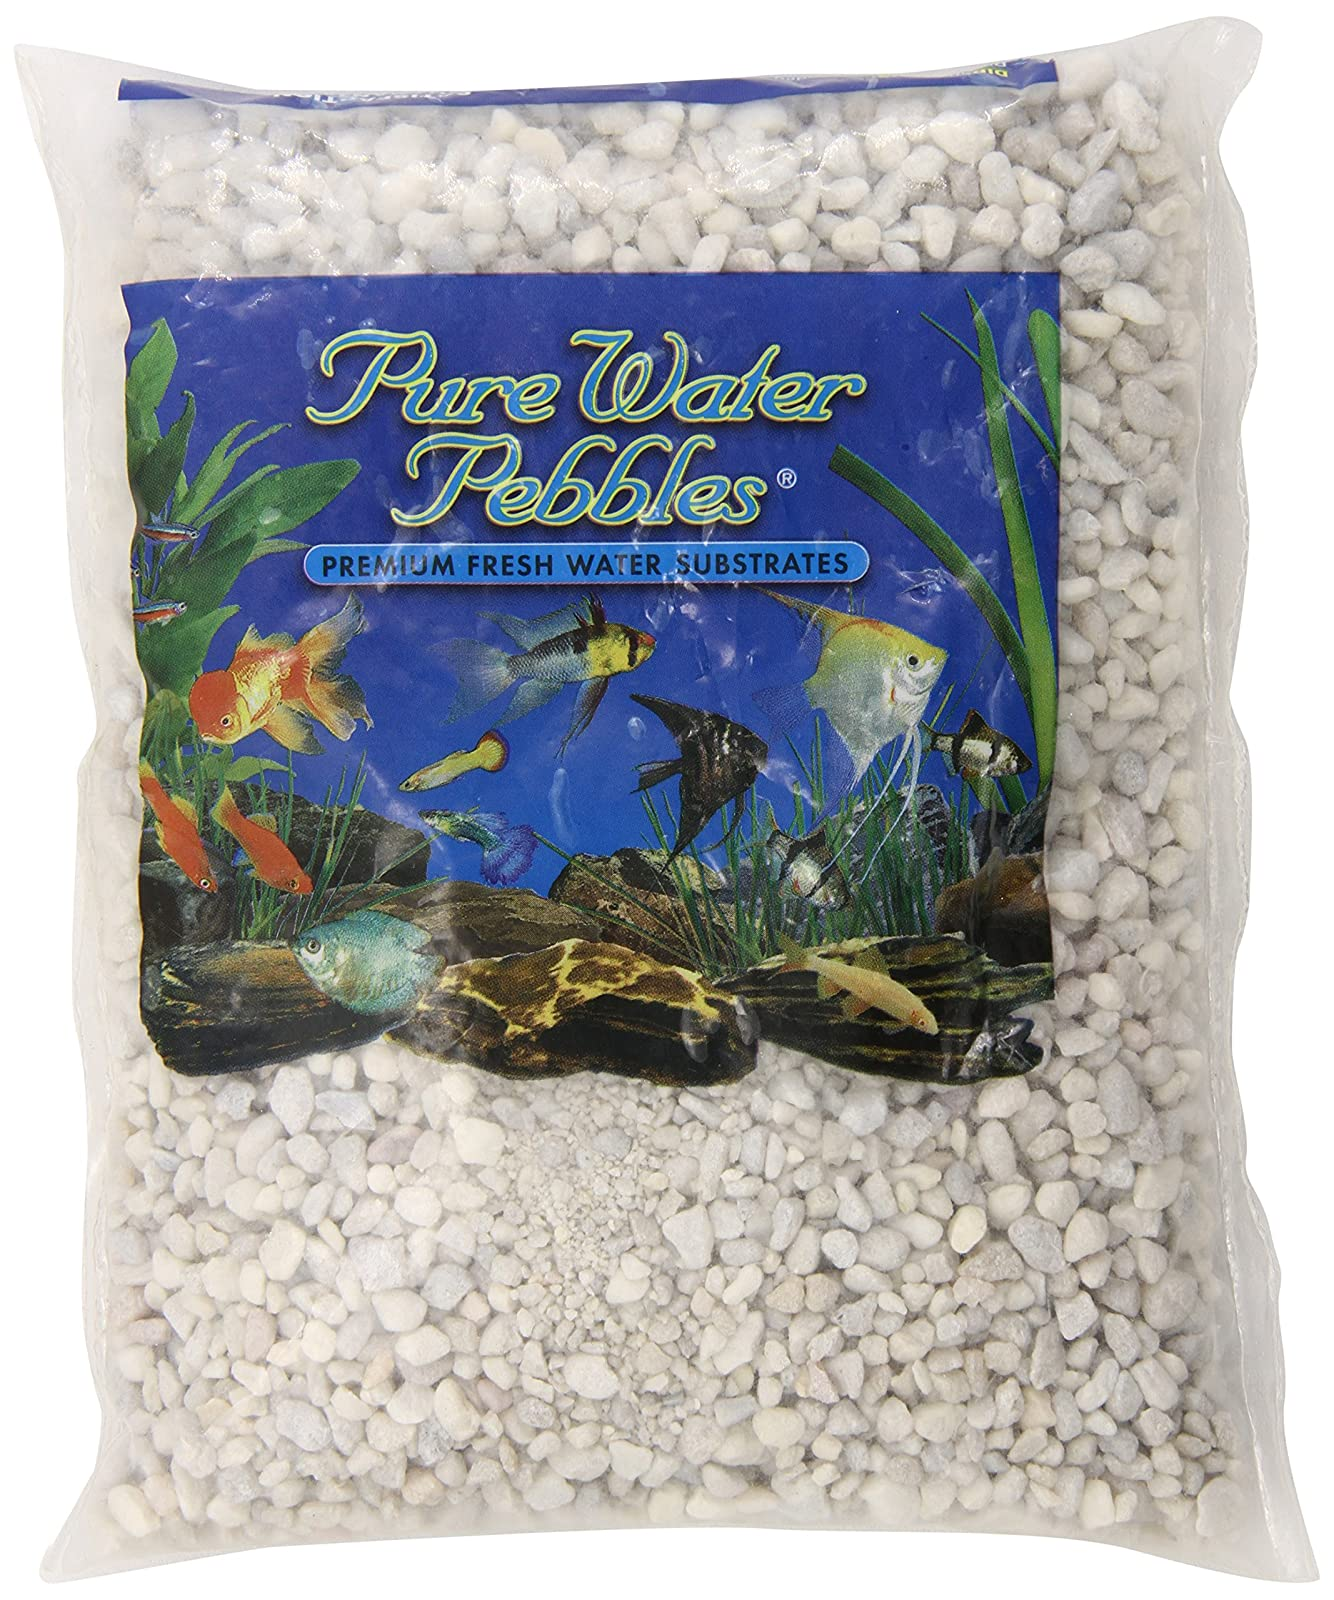 Pure Water Pebbles Aquarium Gravel 2-Pound 70012 white 0.5 In Wide/4ft. - 1